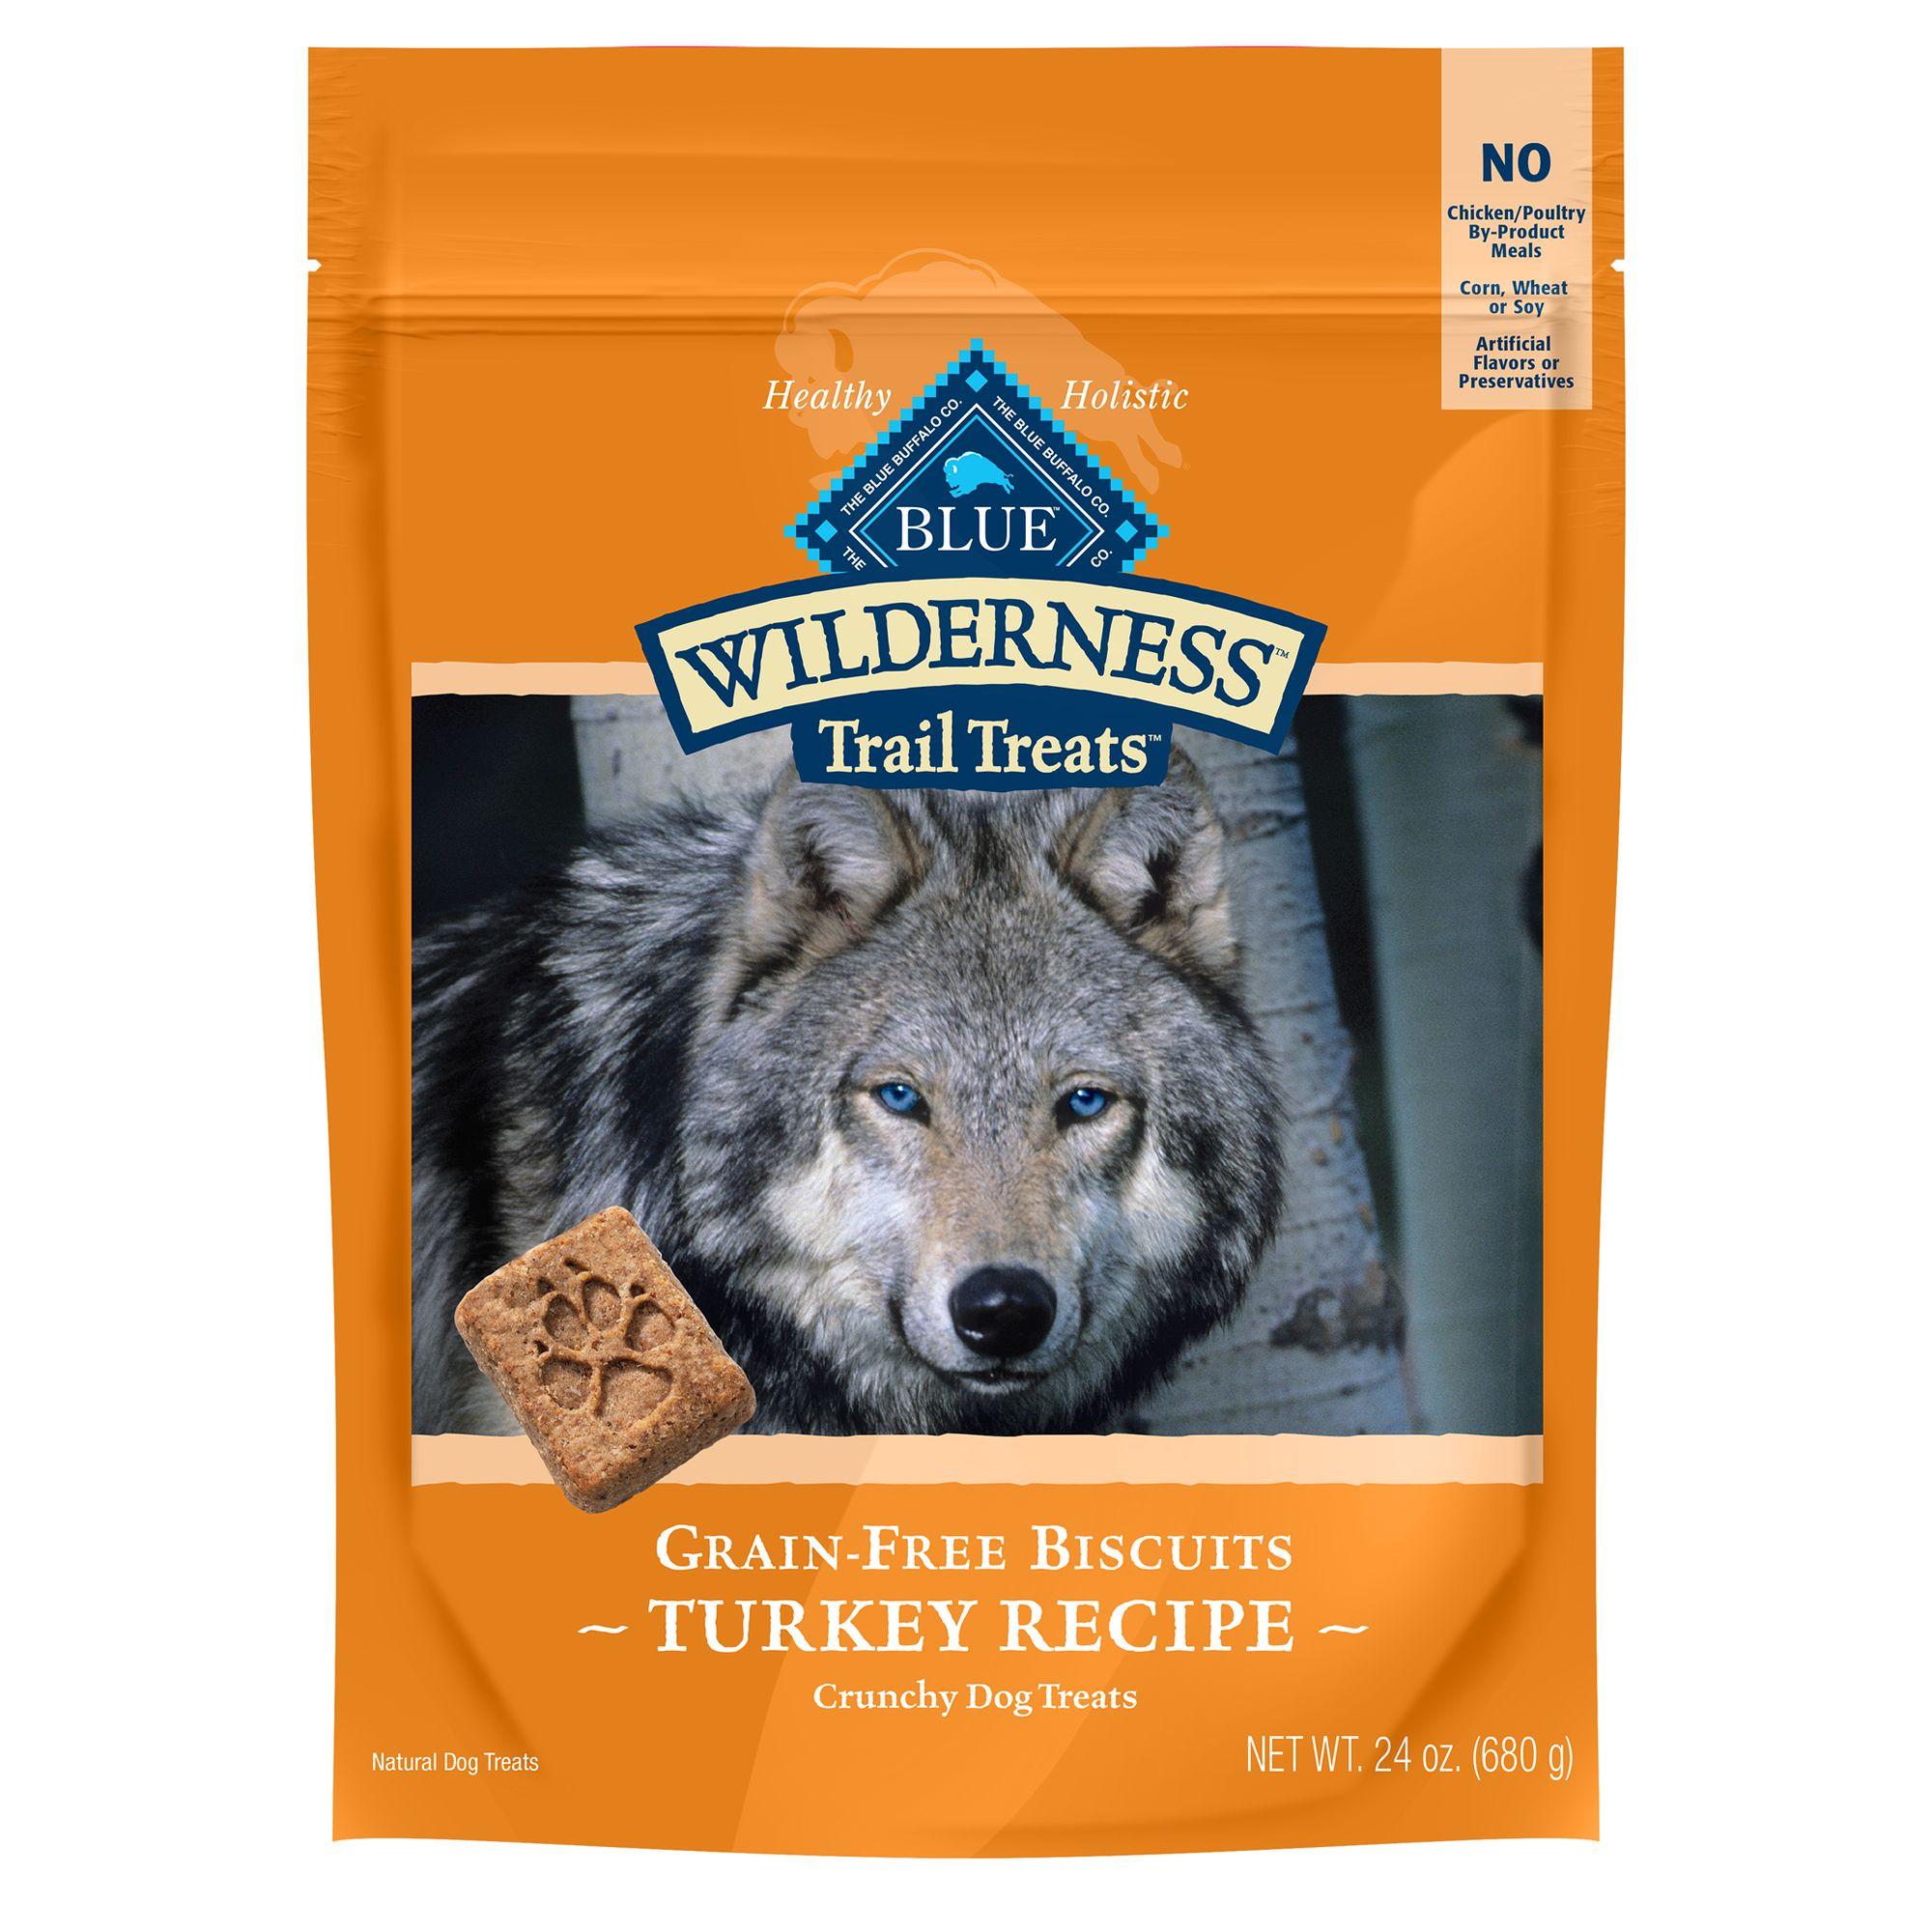 Blue Wilderness® Trail Treats Grain Free Turkey Dog Trea